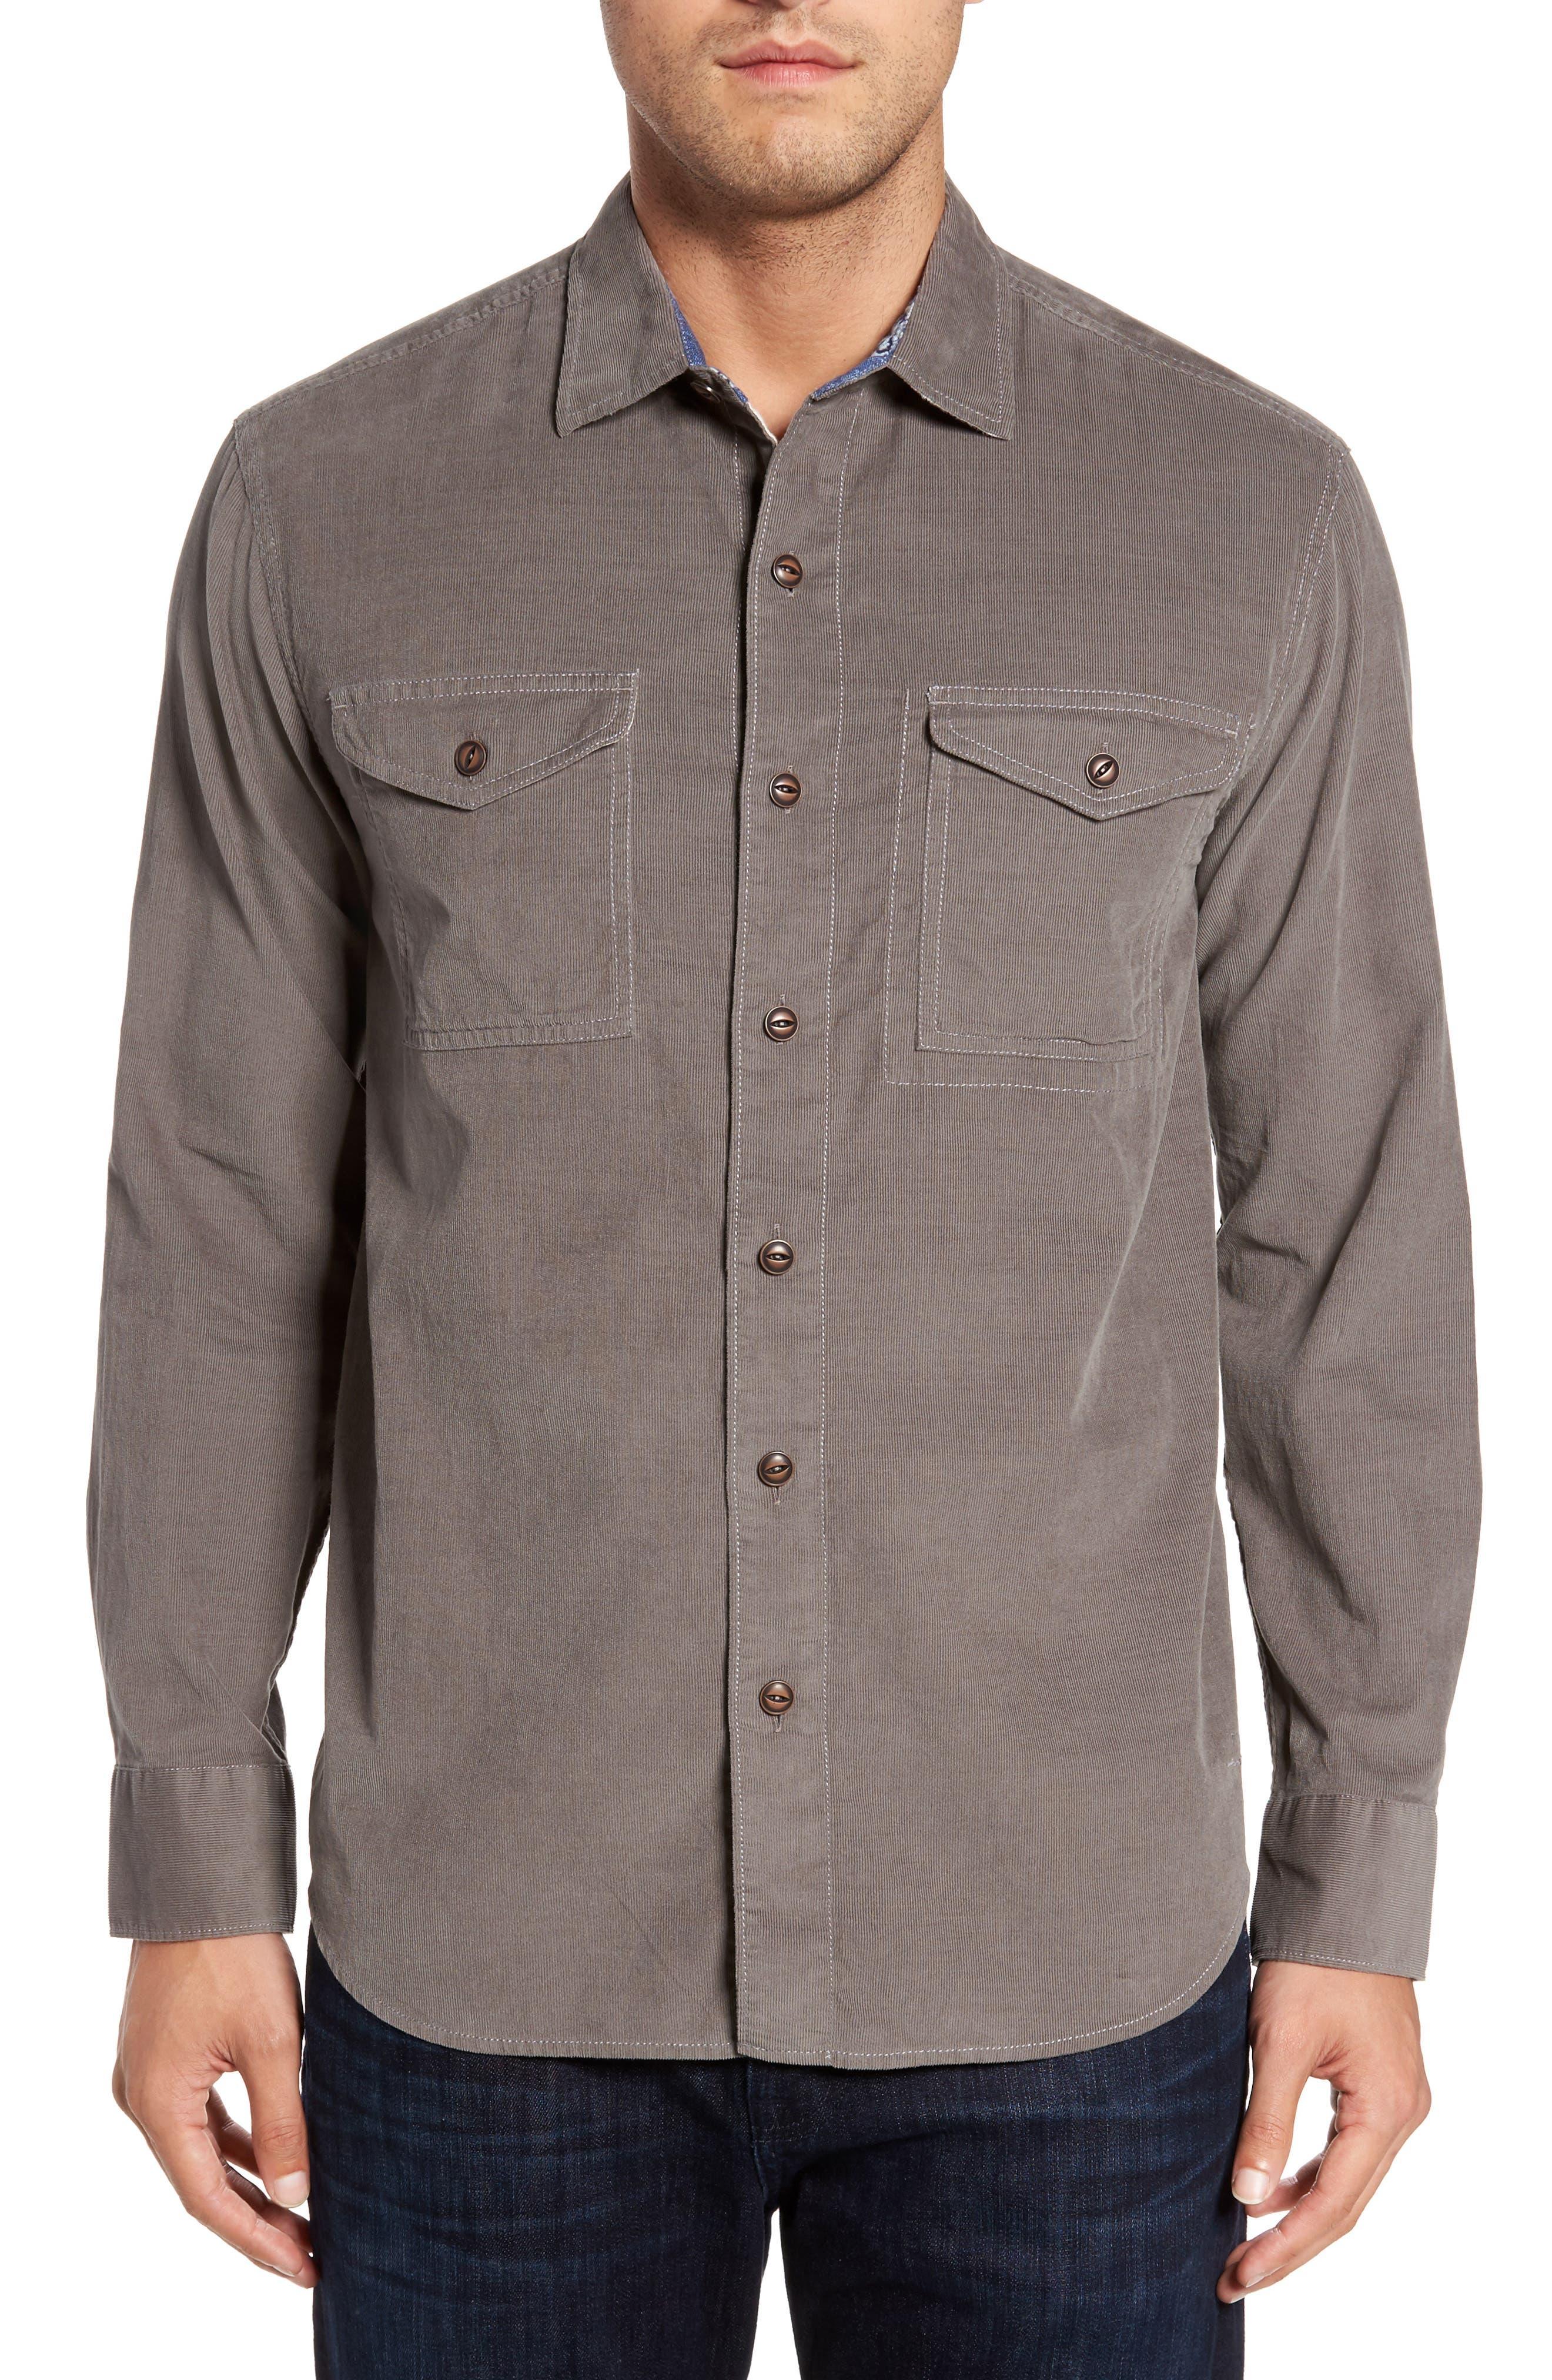 Harrison Cord Standard Fit Shirt,                         Main,                         color, Pebble Grey